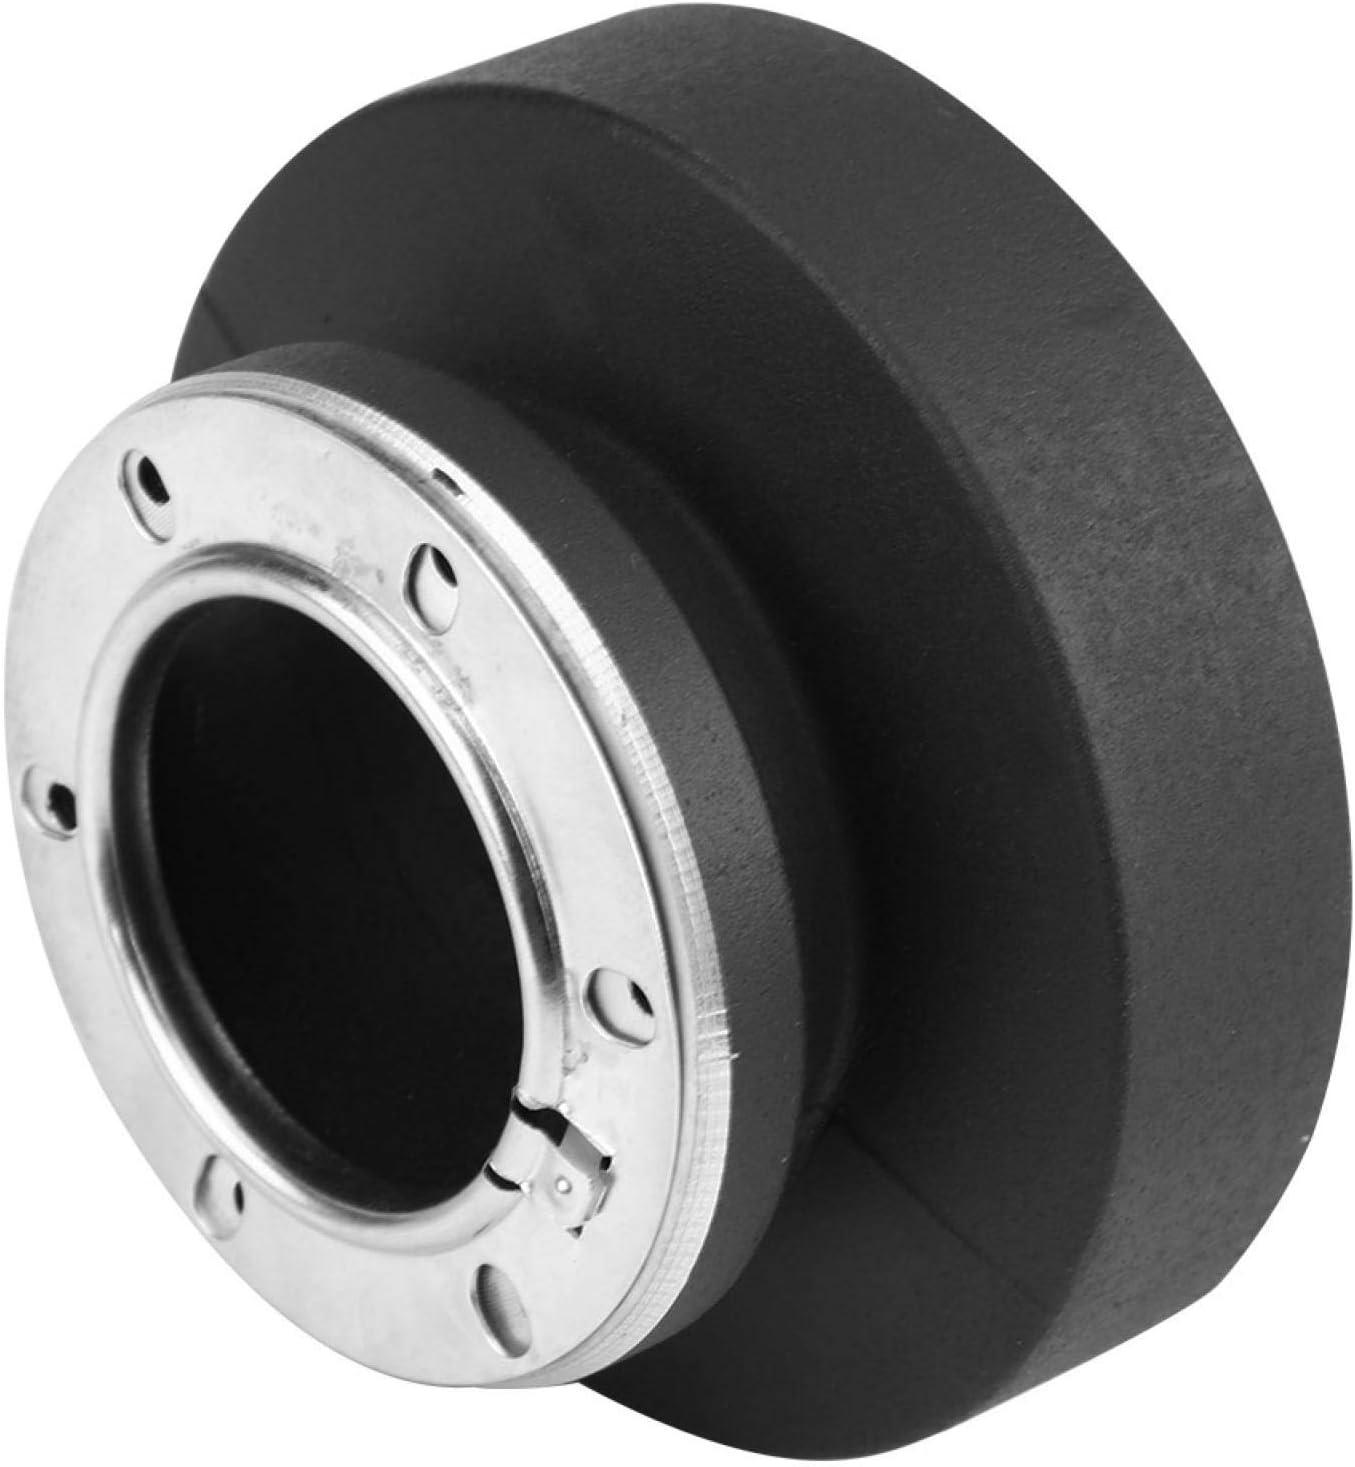 Ymiko Qiilu 6 Hole Bolt Steering Adapter Wheel Kit 0.78inche Popular standard Inventory cleanup selling sale Hub